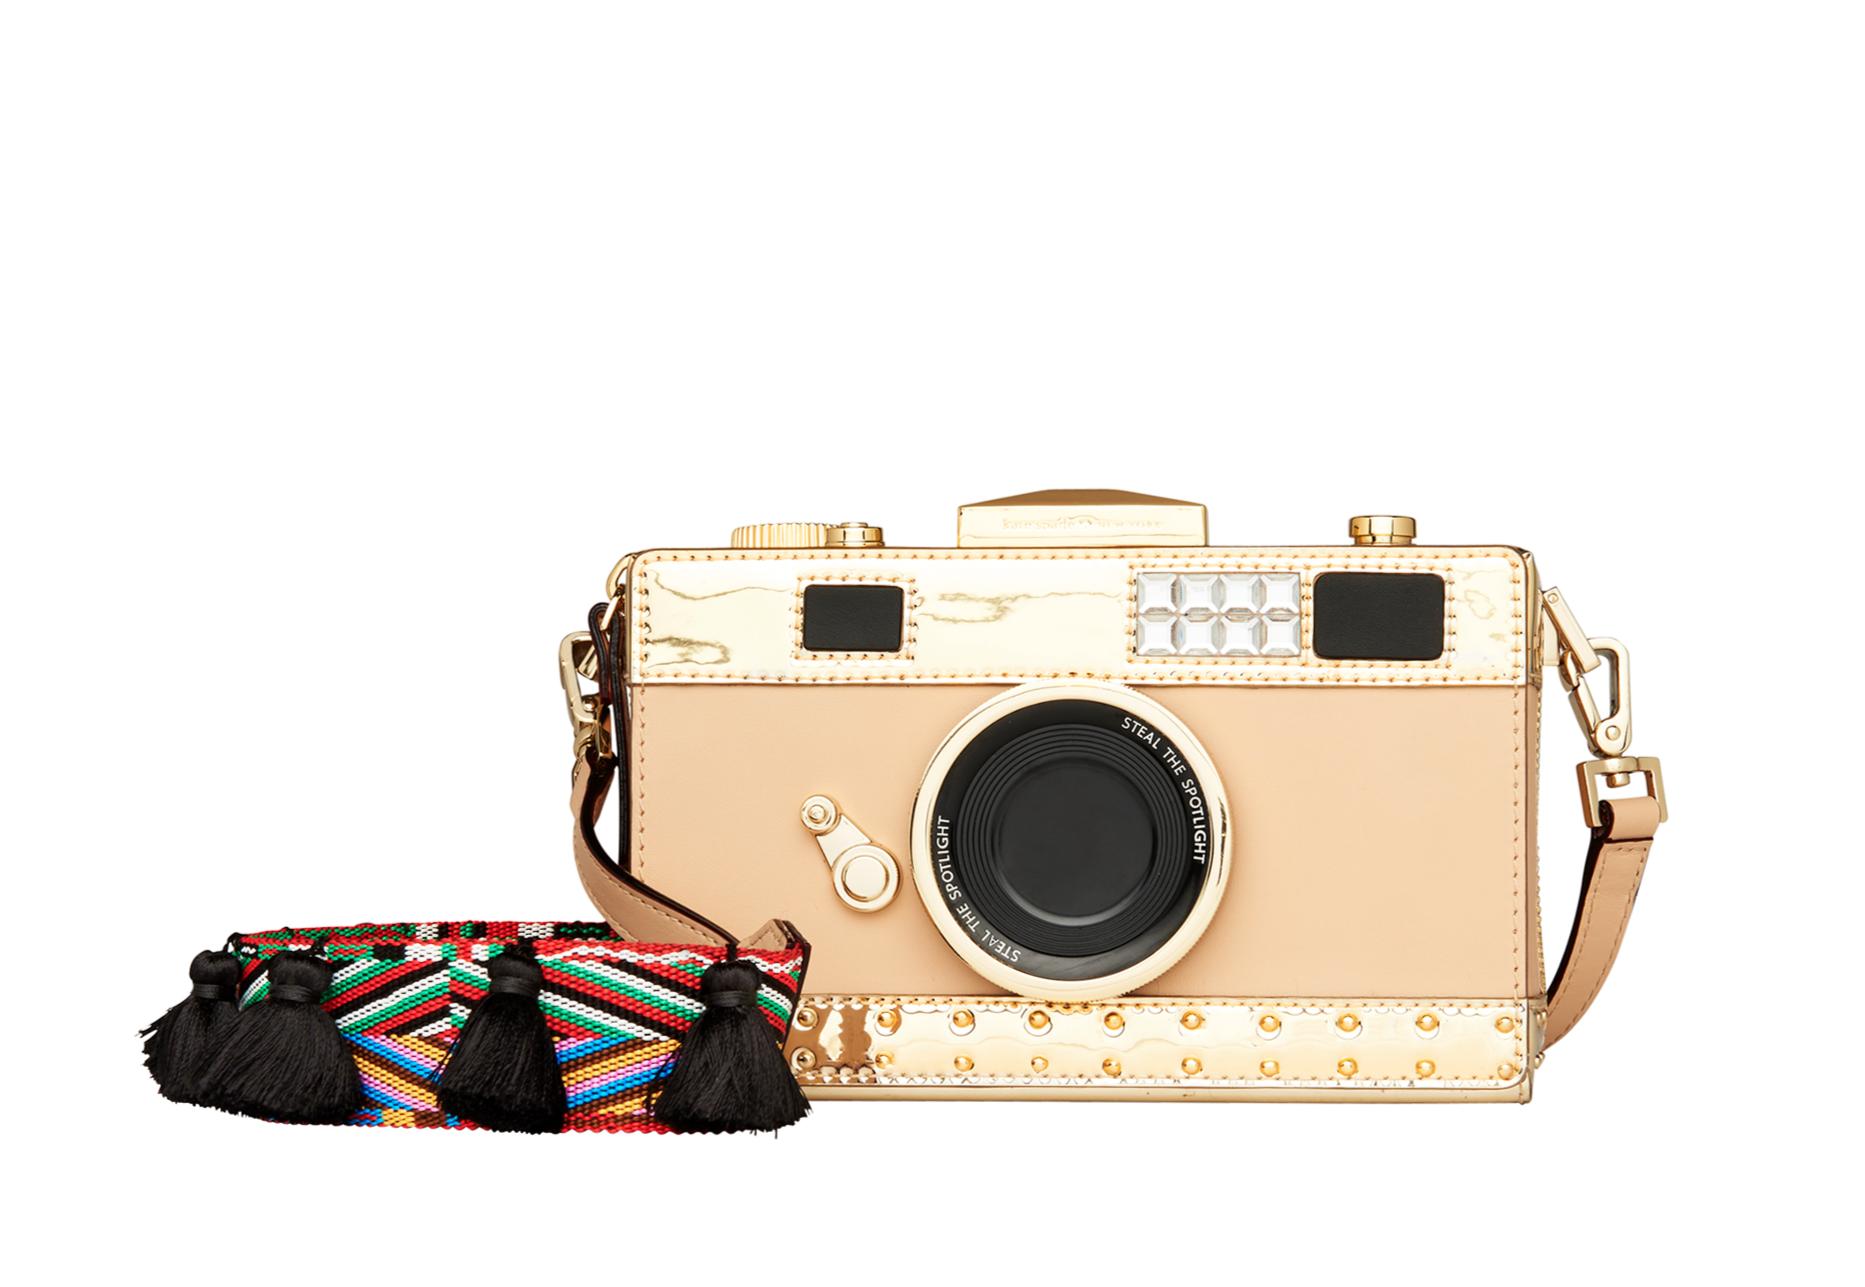 Kate Spade Camera Handbag